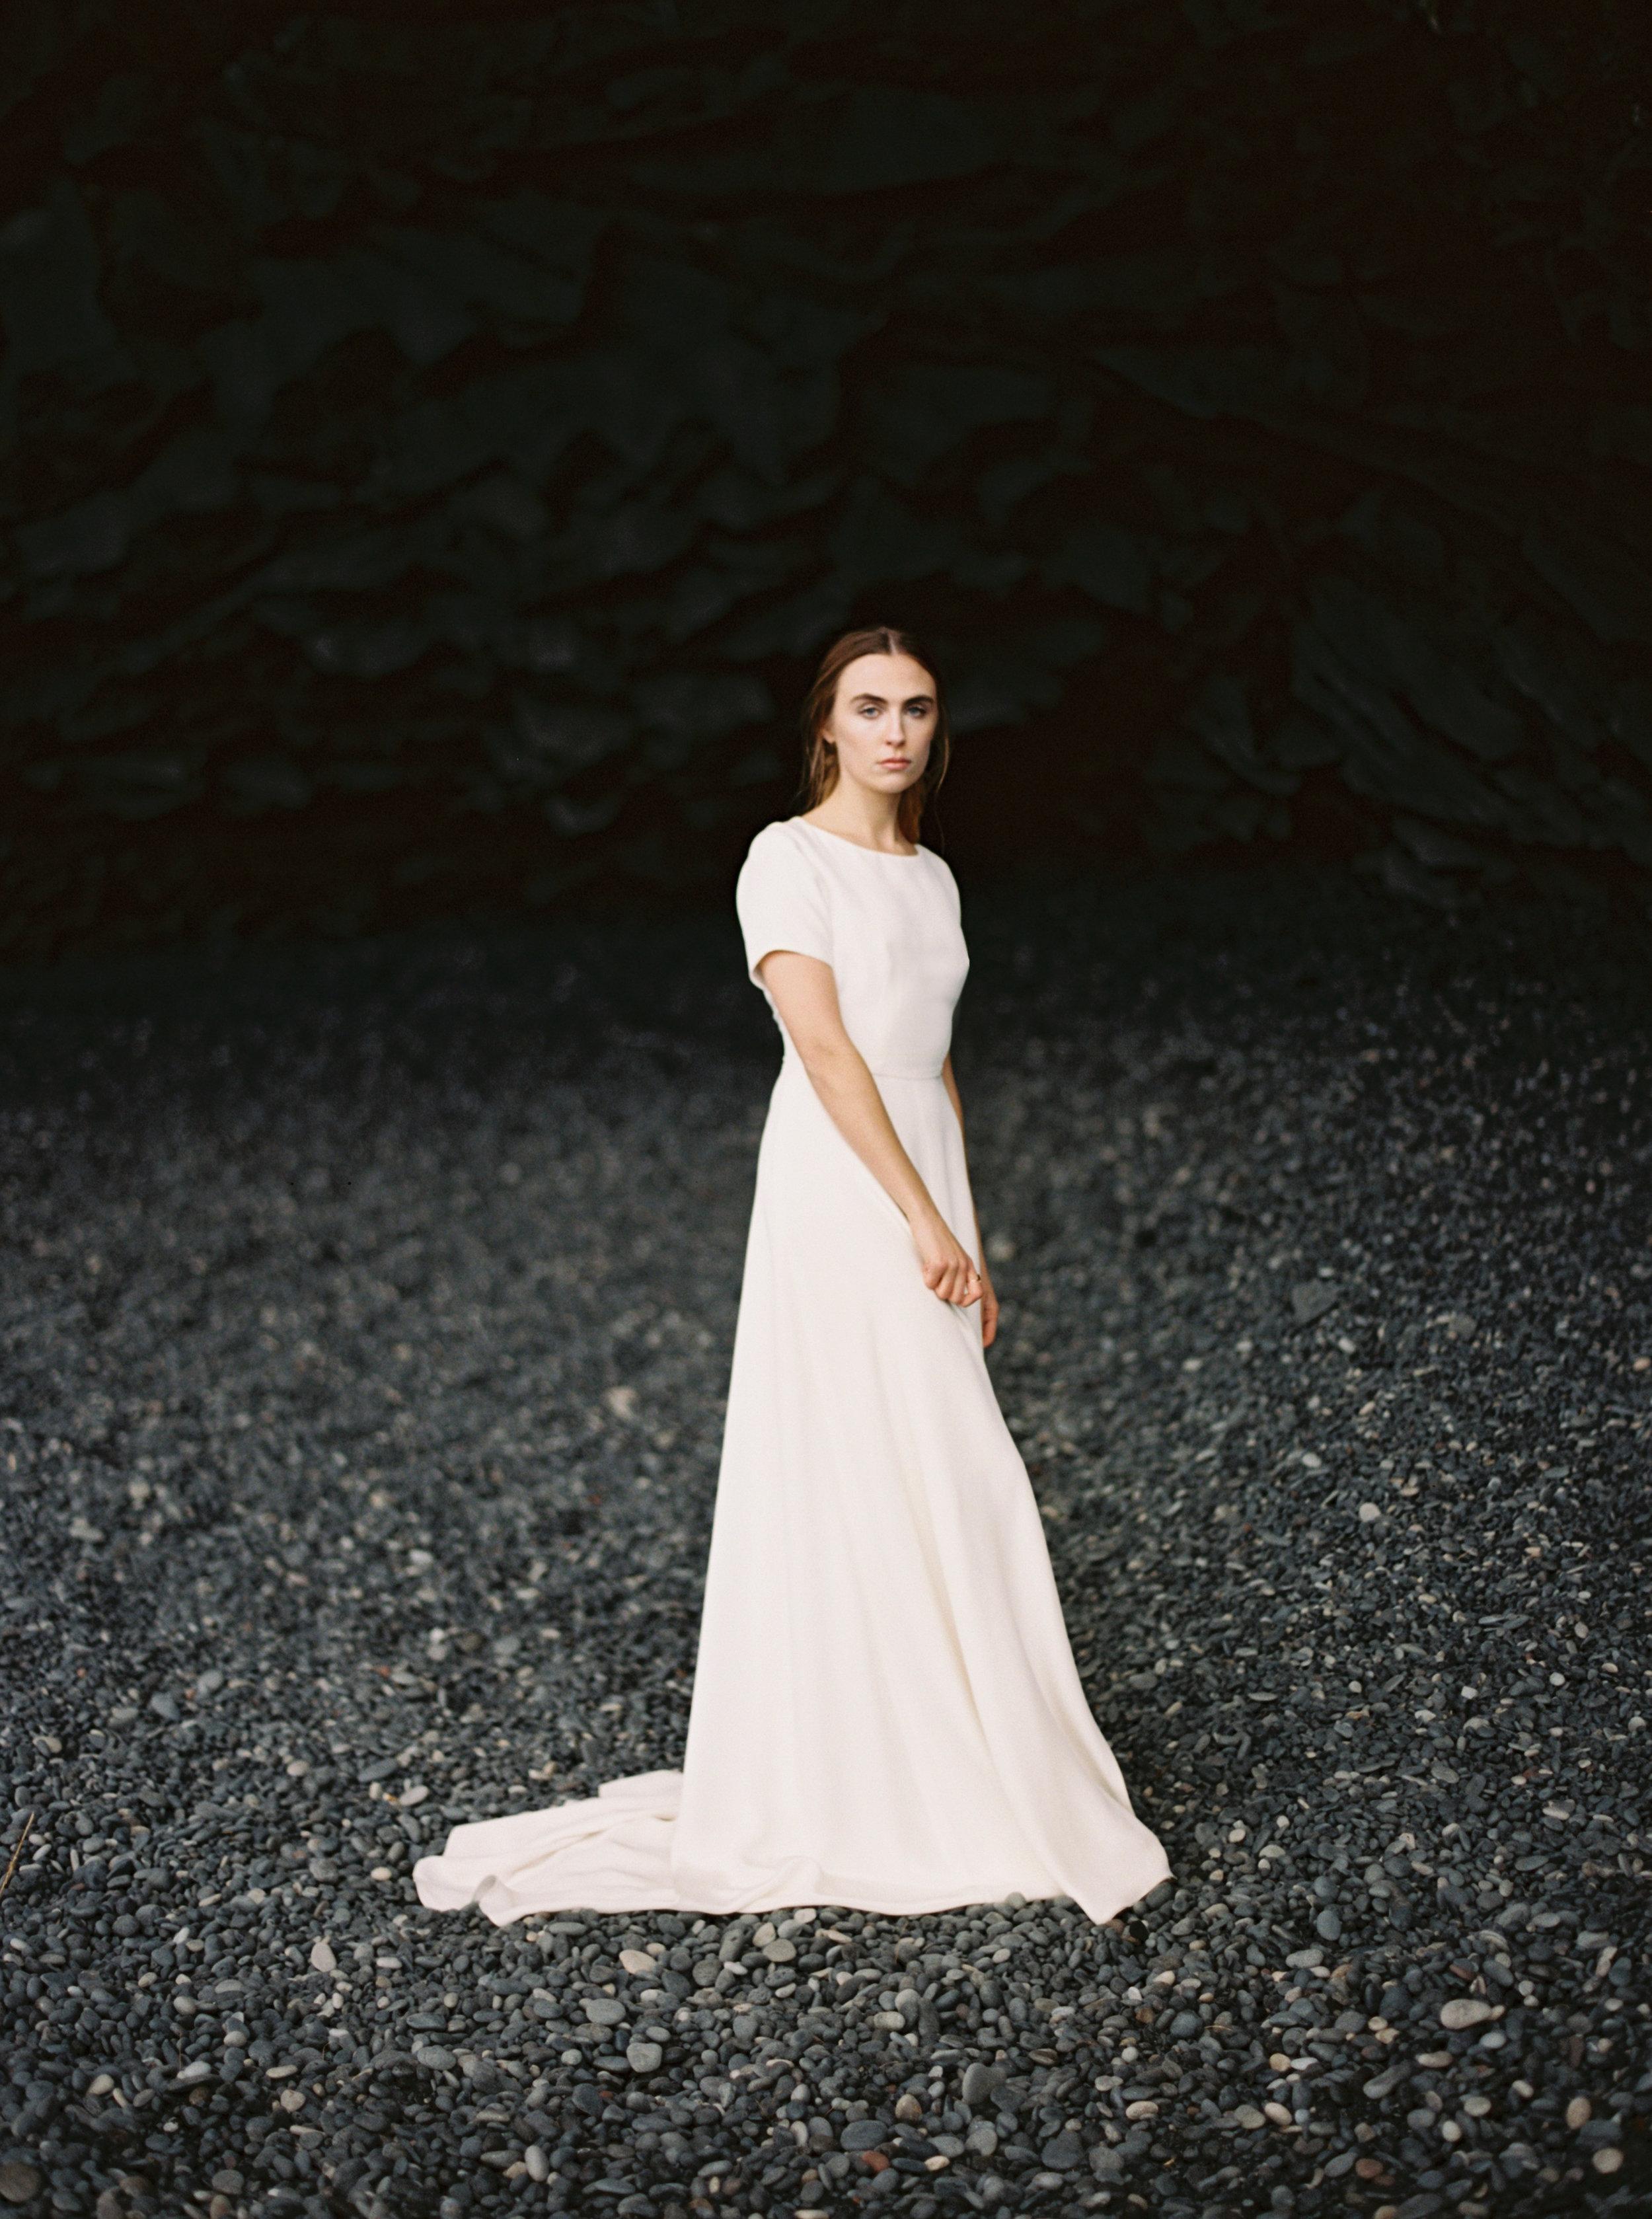 Kyle John l Fine Art Wedding Photography l Chicago, Copenhagen, California, New York, Destination l Blog l Part Three_Iceland_14